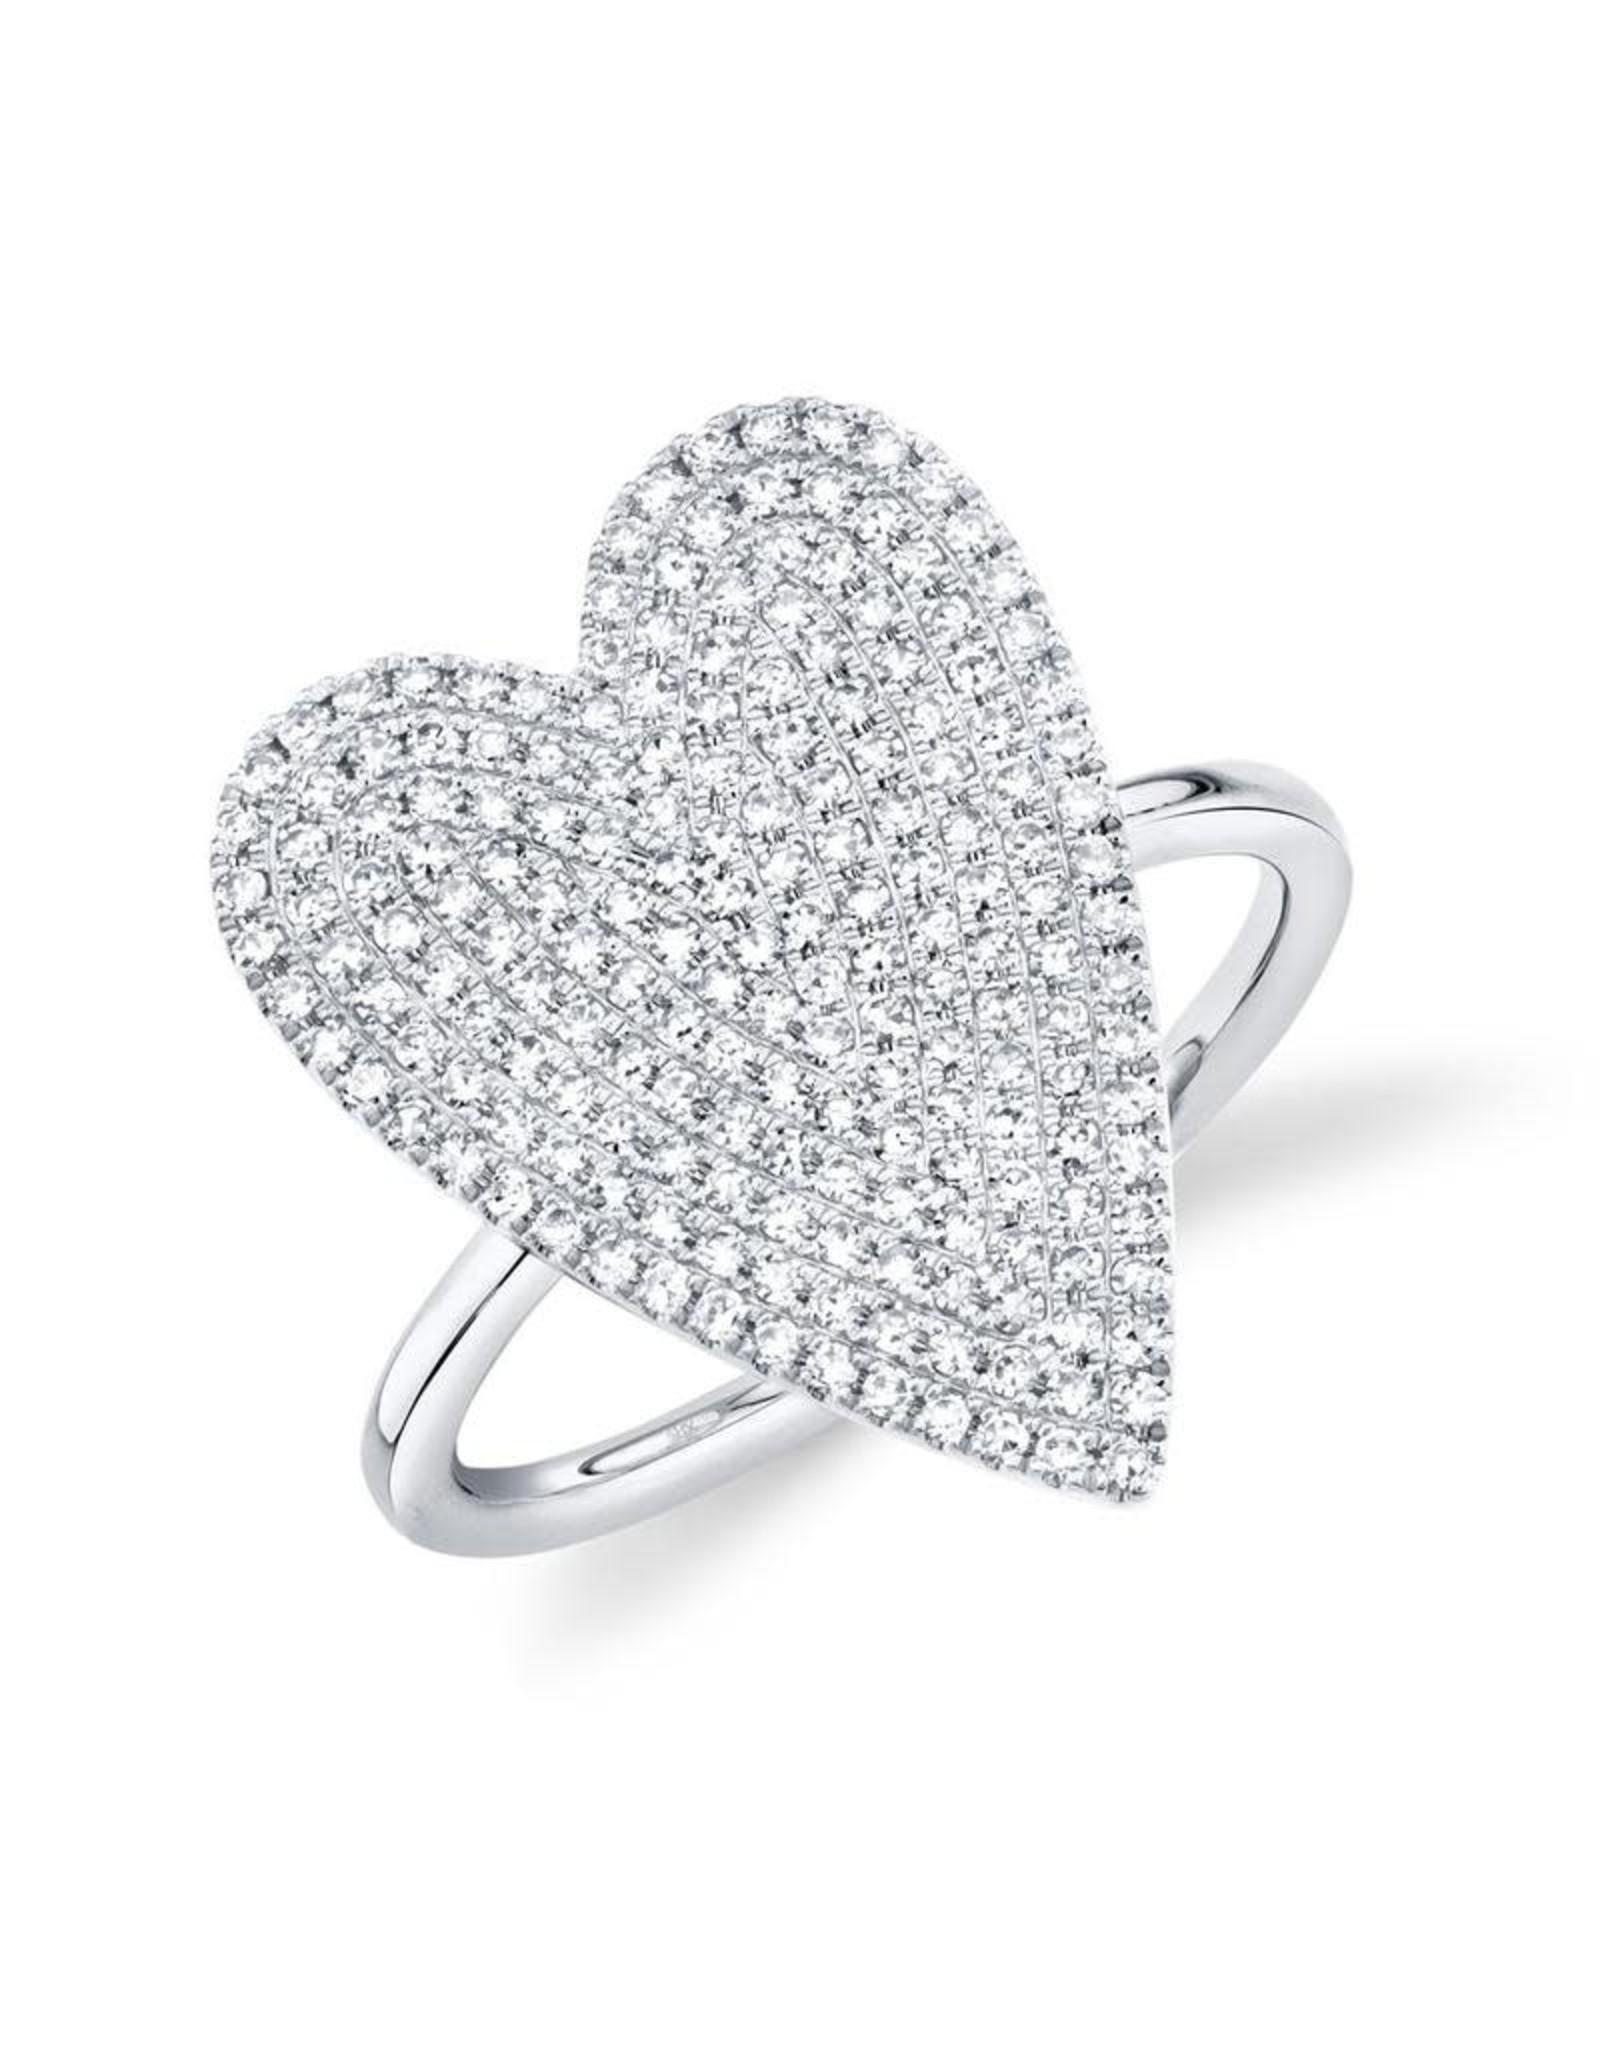 14K White Gold Diamond Pave Heart Ring, D: 0.26ct